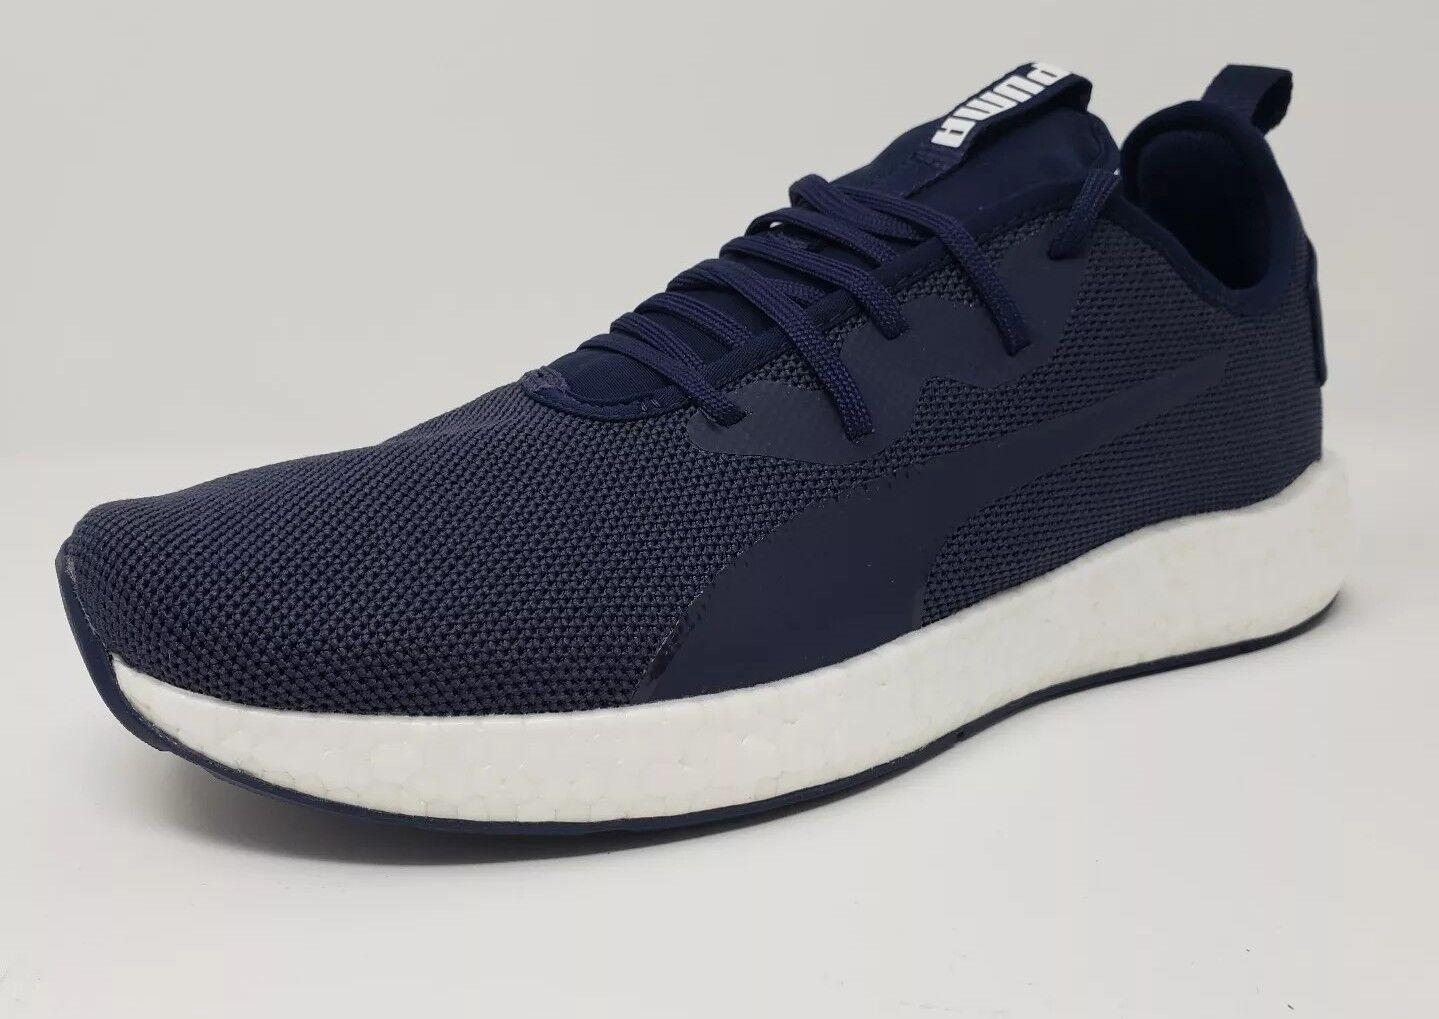 395b7e58aed PUMA NRGY Neko Sport Sneaker 9M Men s zypnhw1577-Athletic Shoes ...